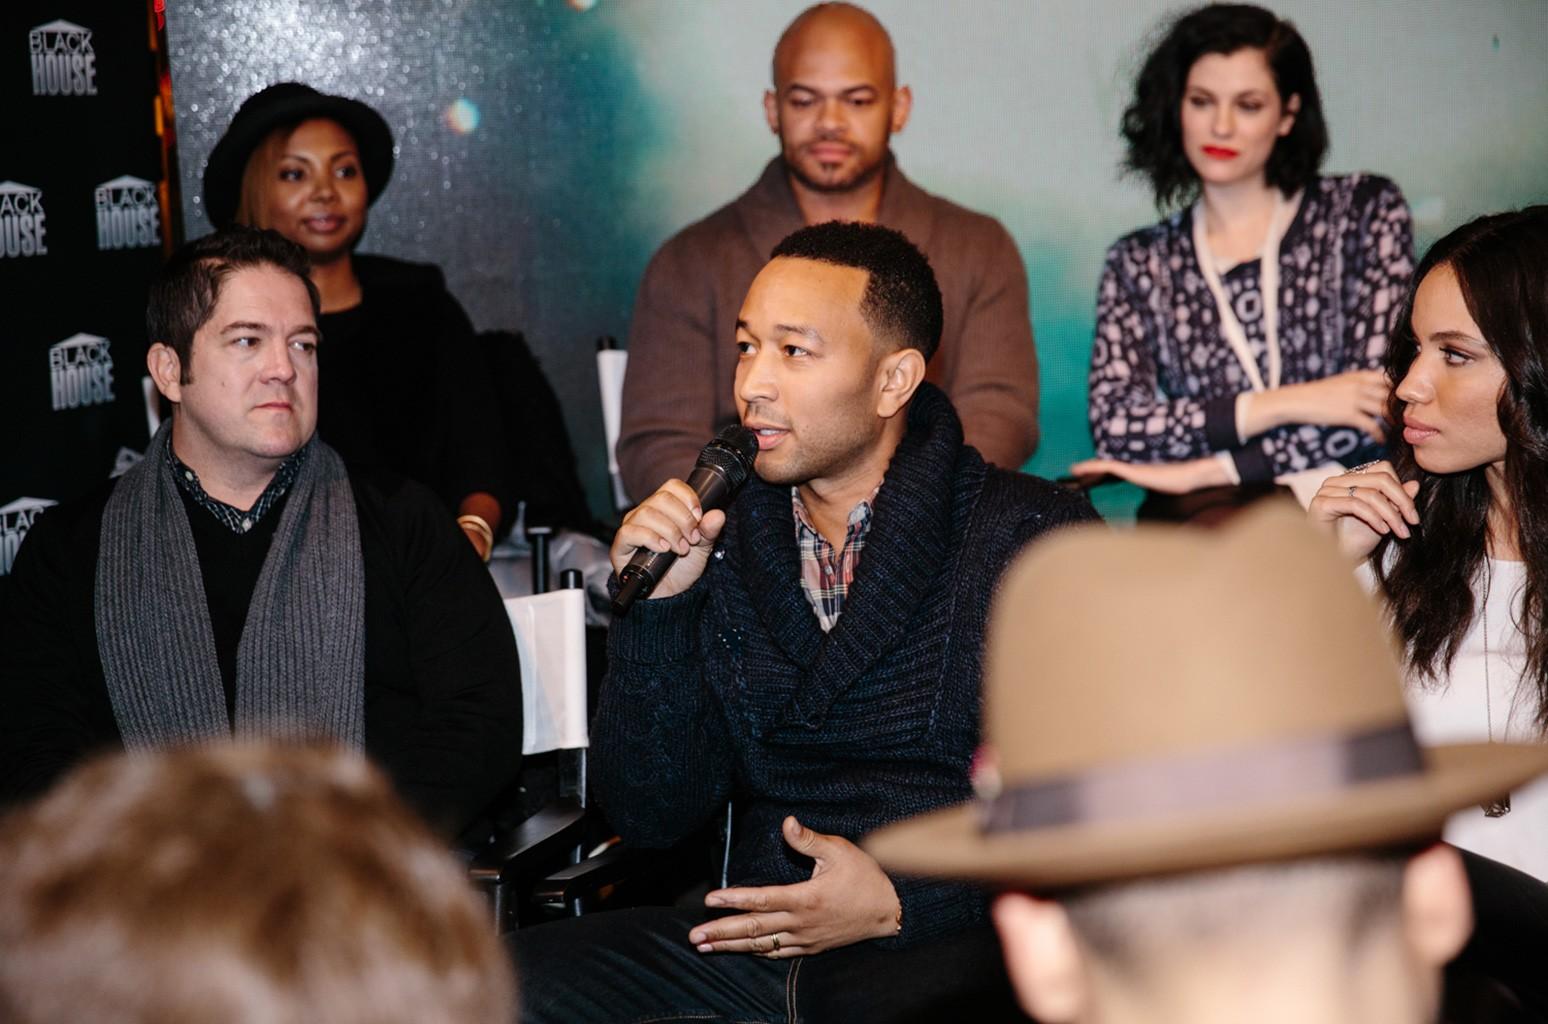 John Legend at Blackhouse Foundation's 2016 Sundance summit.